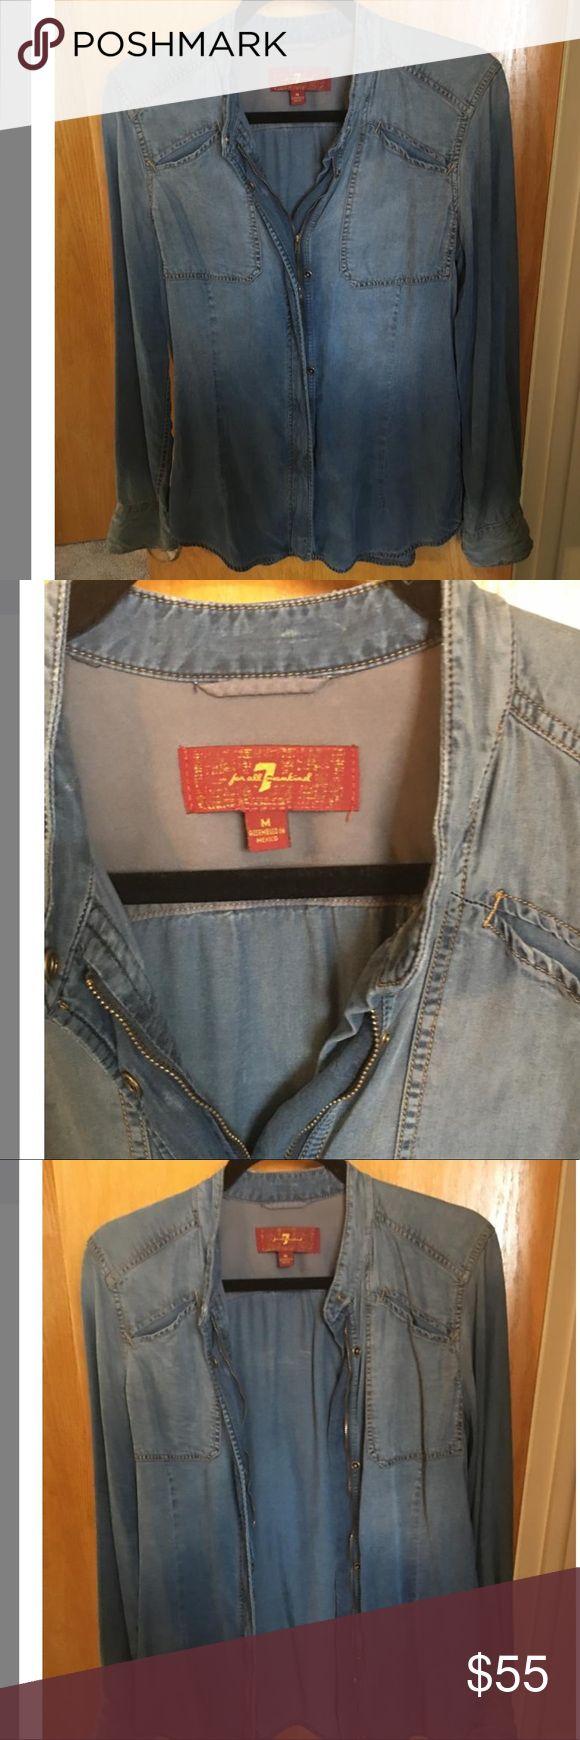 7 FAM Denim shirt Very soft, great quality denim zip up denim shirt 7 For All Mankind Tops Tunics